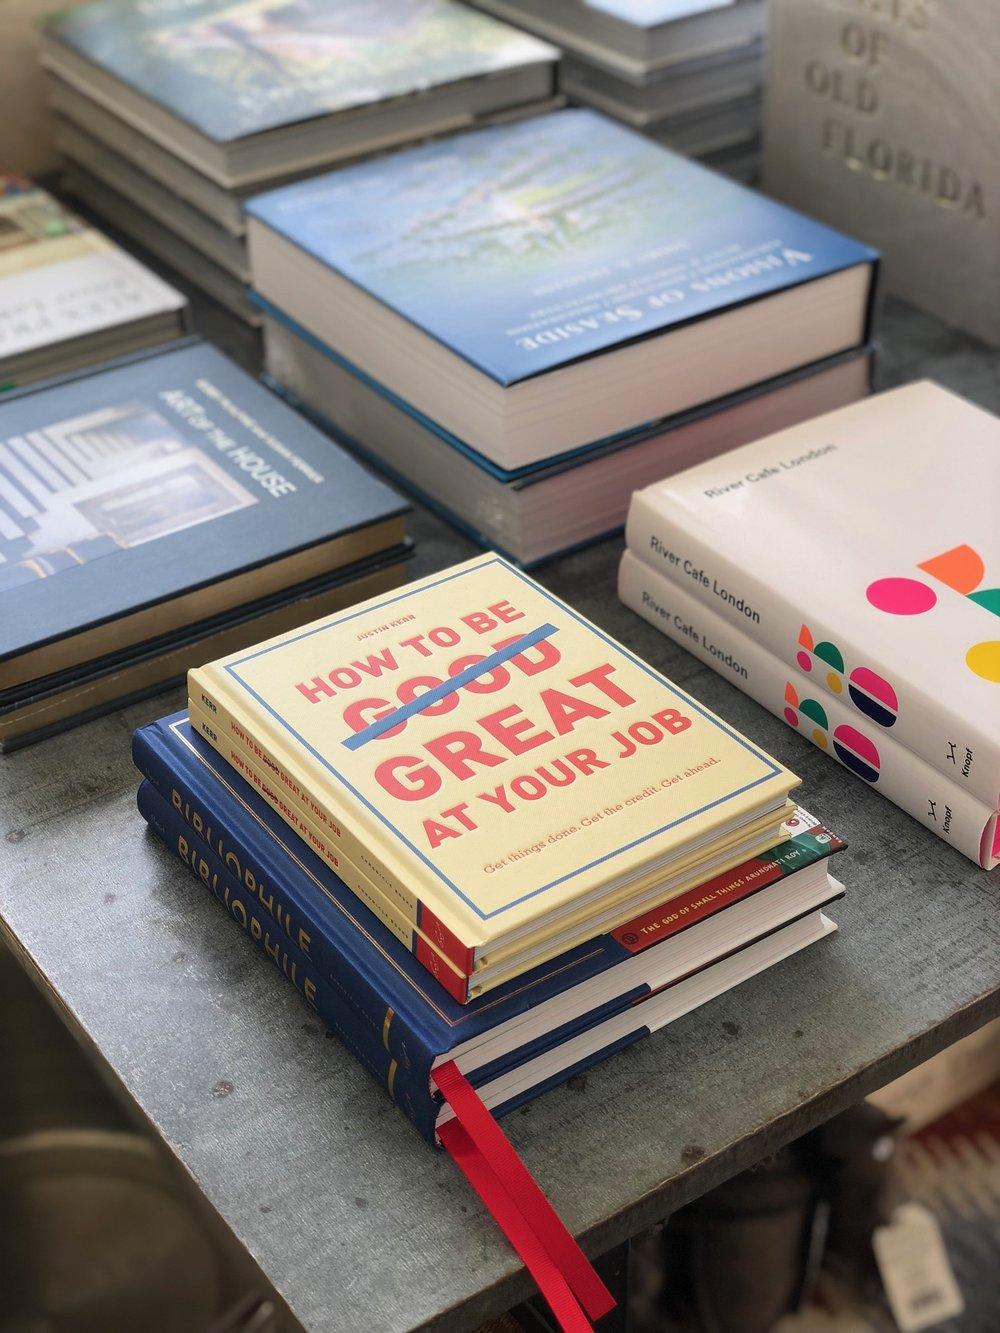 Leola&Croff Books.jpg